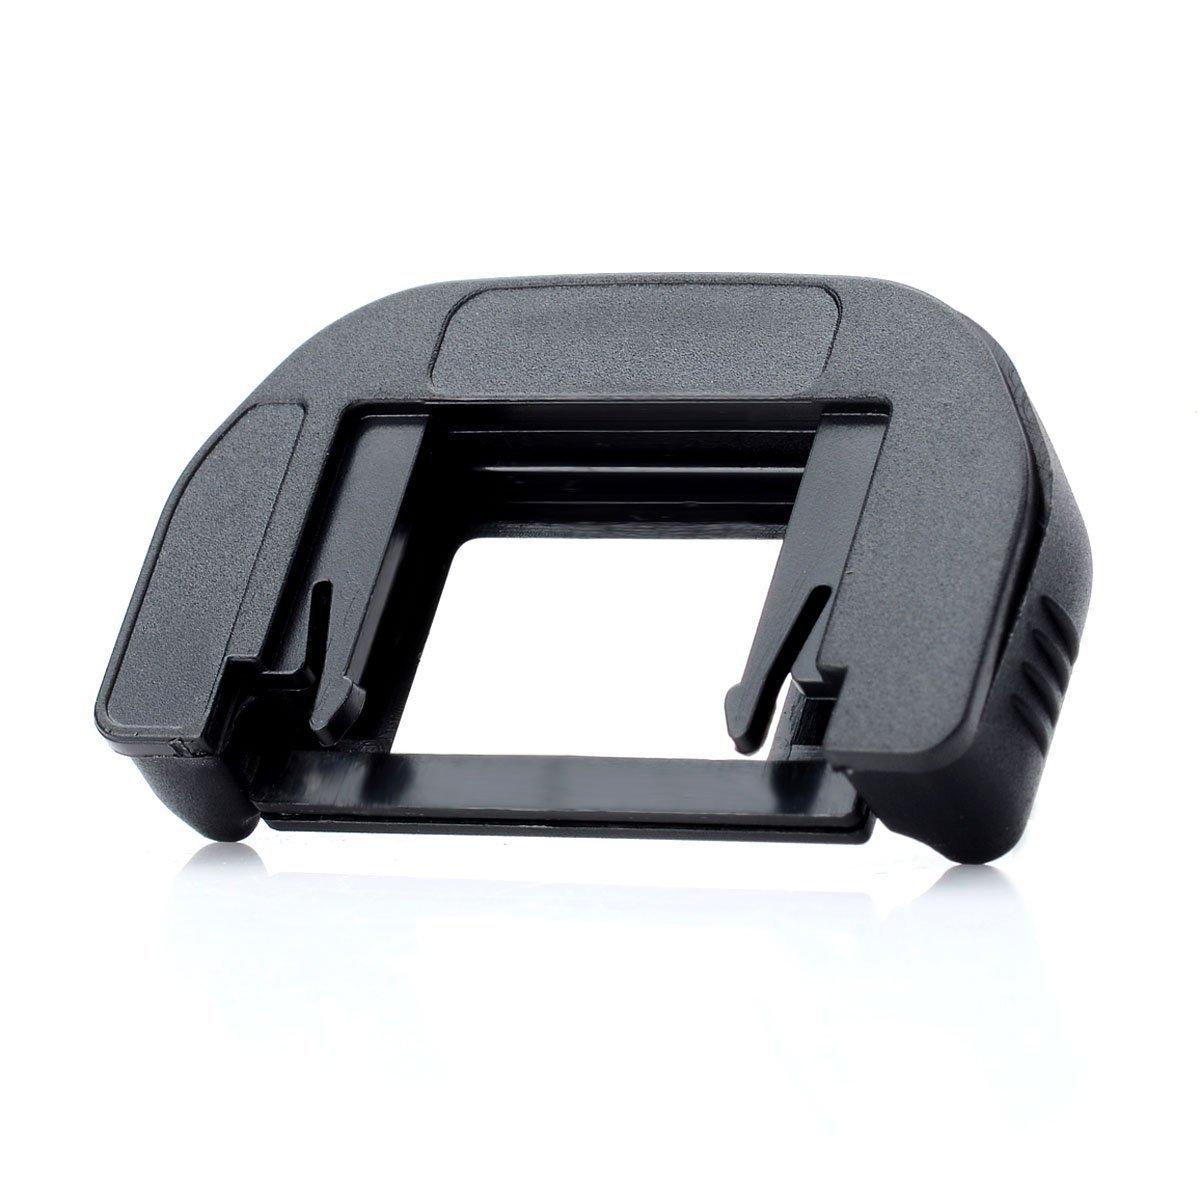 Cámara réflex digital visor ocular para Canon 650d/550d/500d/450d ...